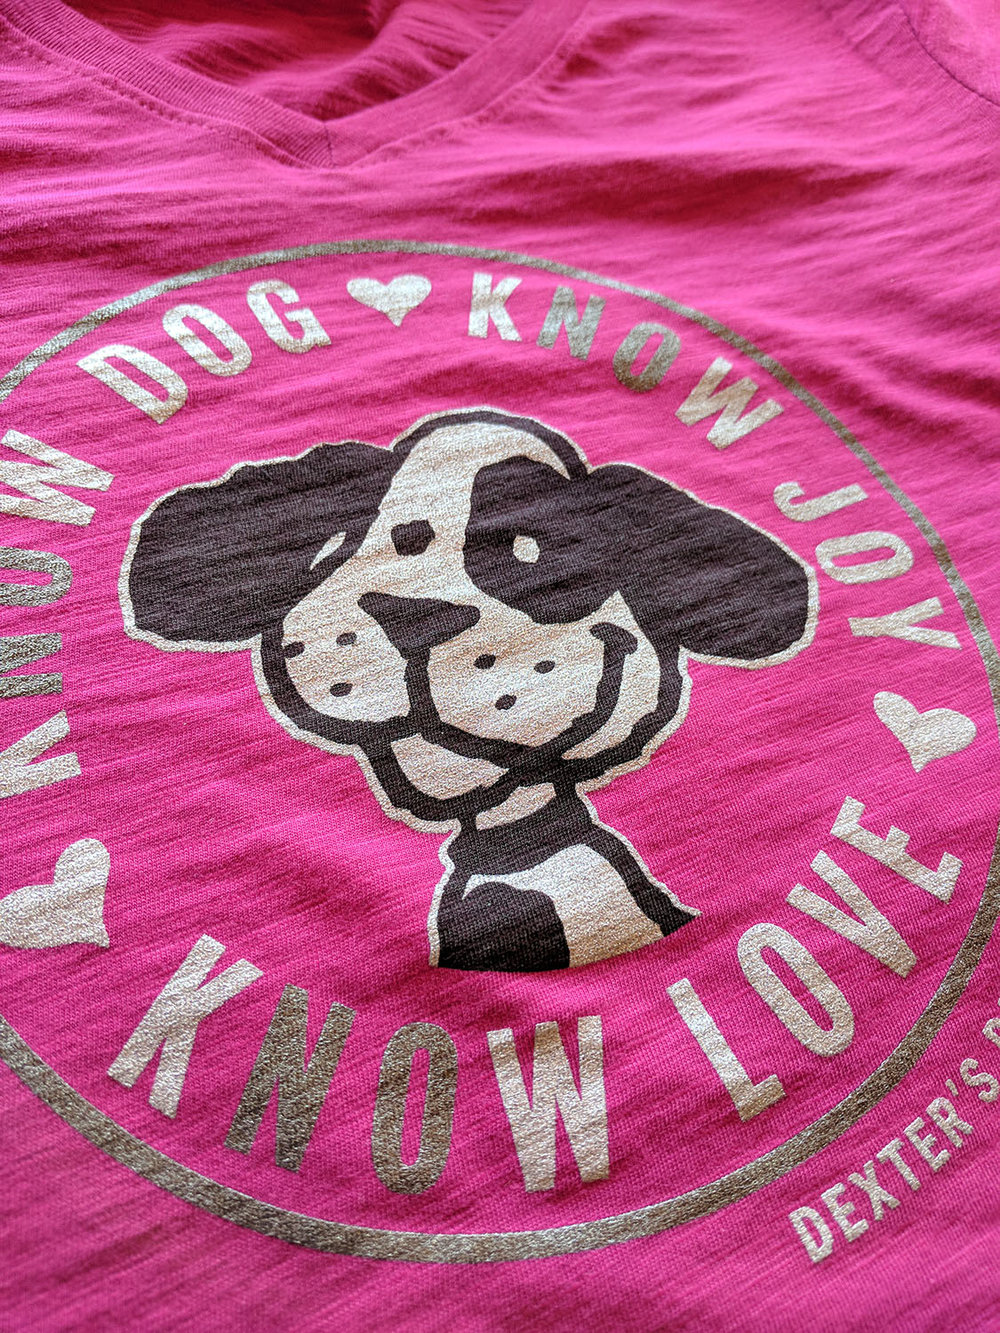 Local_Happy_Customer_Local_Business_Tee_Shirt_Printing_Dog_Shirts.jpg